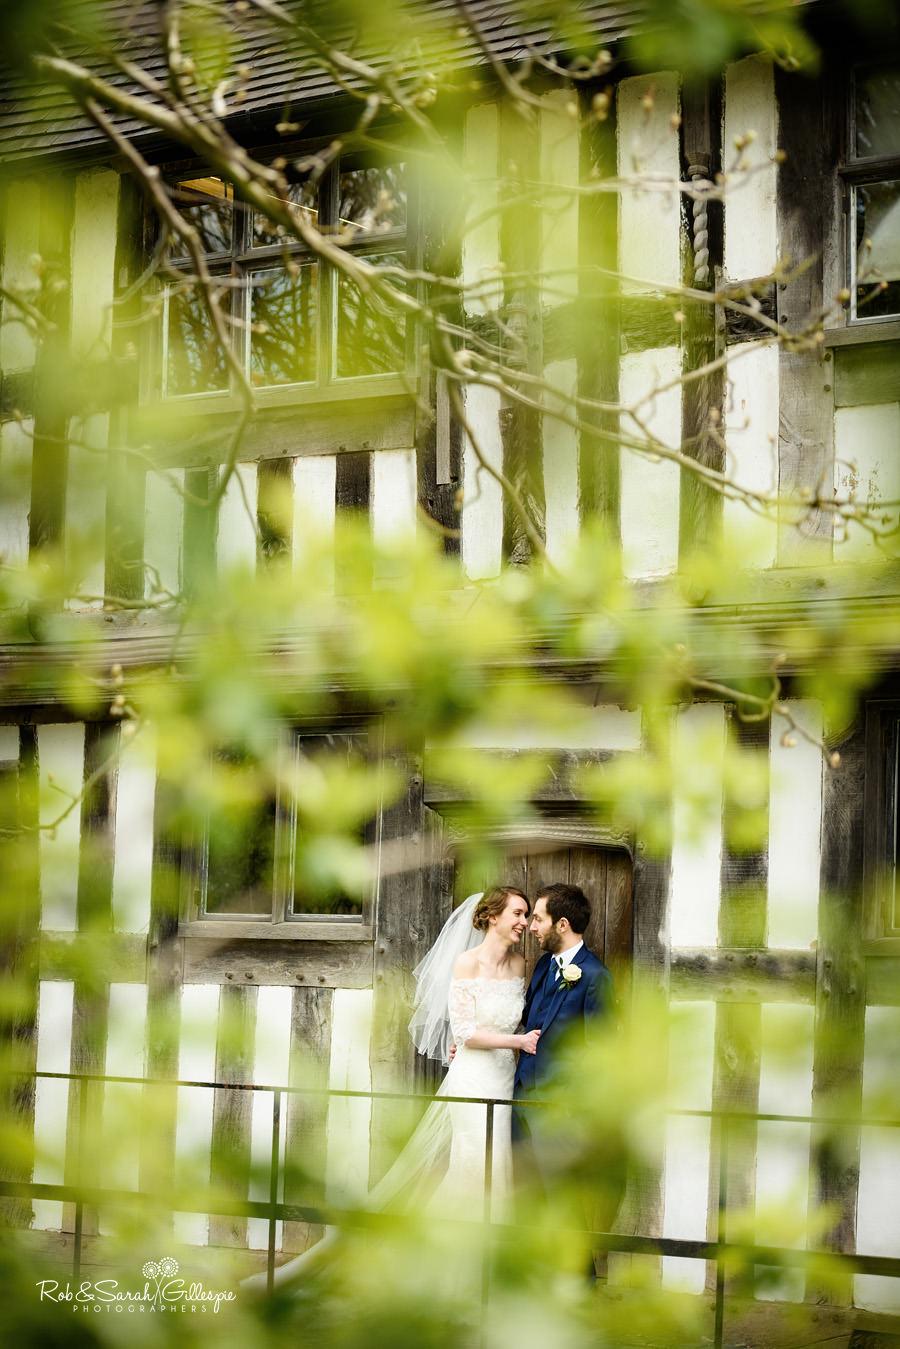 Bride and groom in doorway of old building at Avoncroft Museum